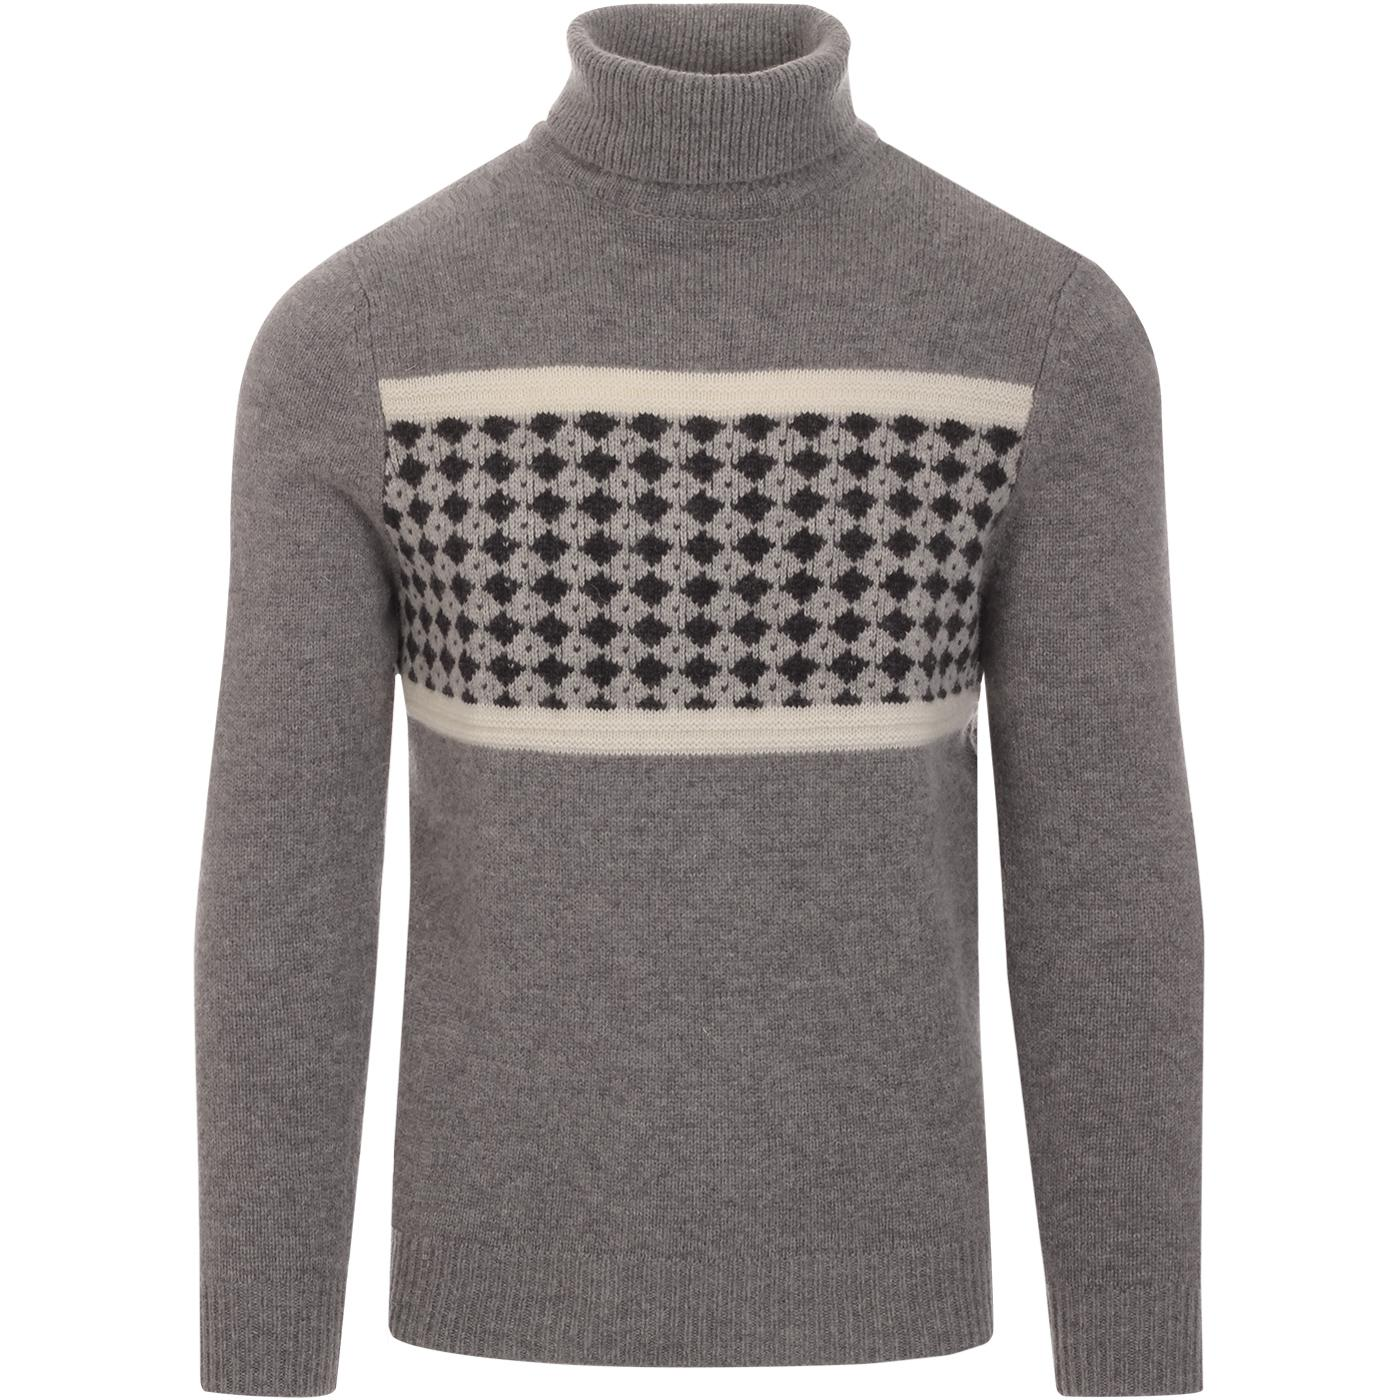 BEN SHERMAN 60s Mod Intarsia Knit Roll Neck Jumper